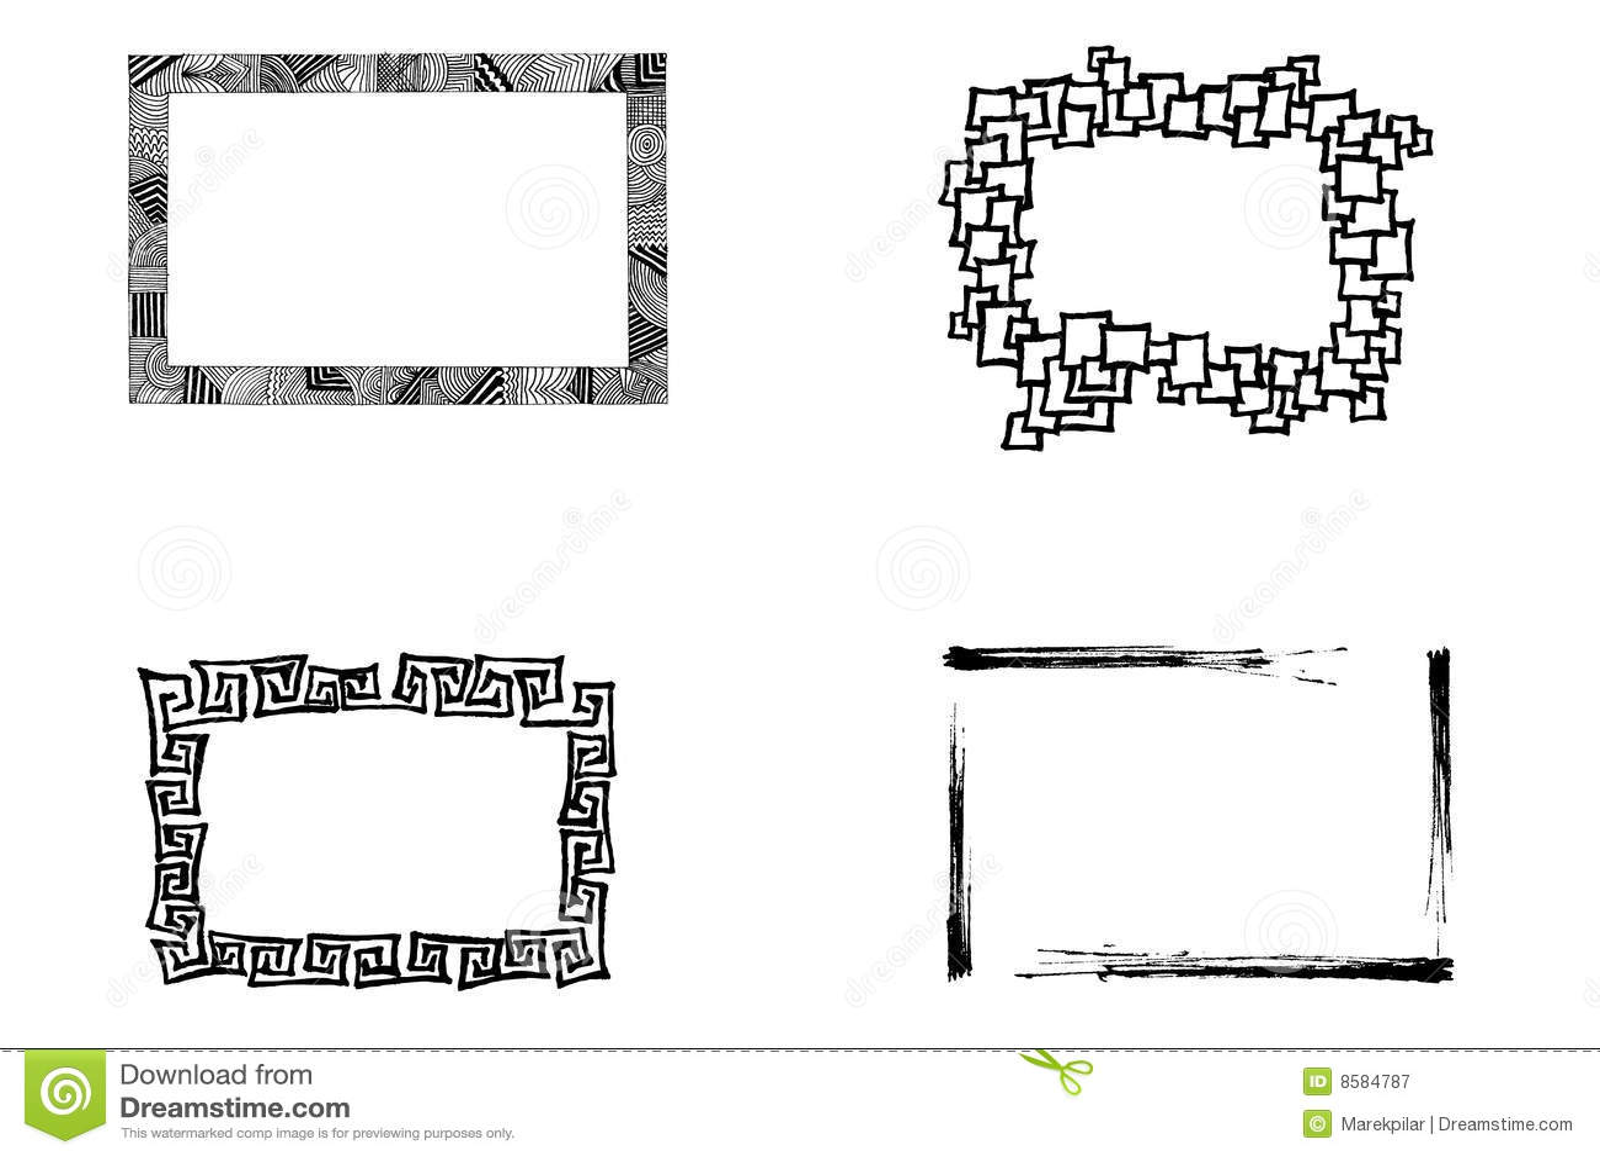 Artistic frames stock vector. Illustration of frames, background ...